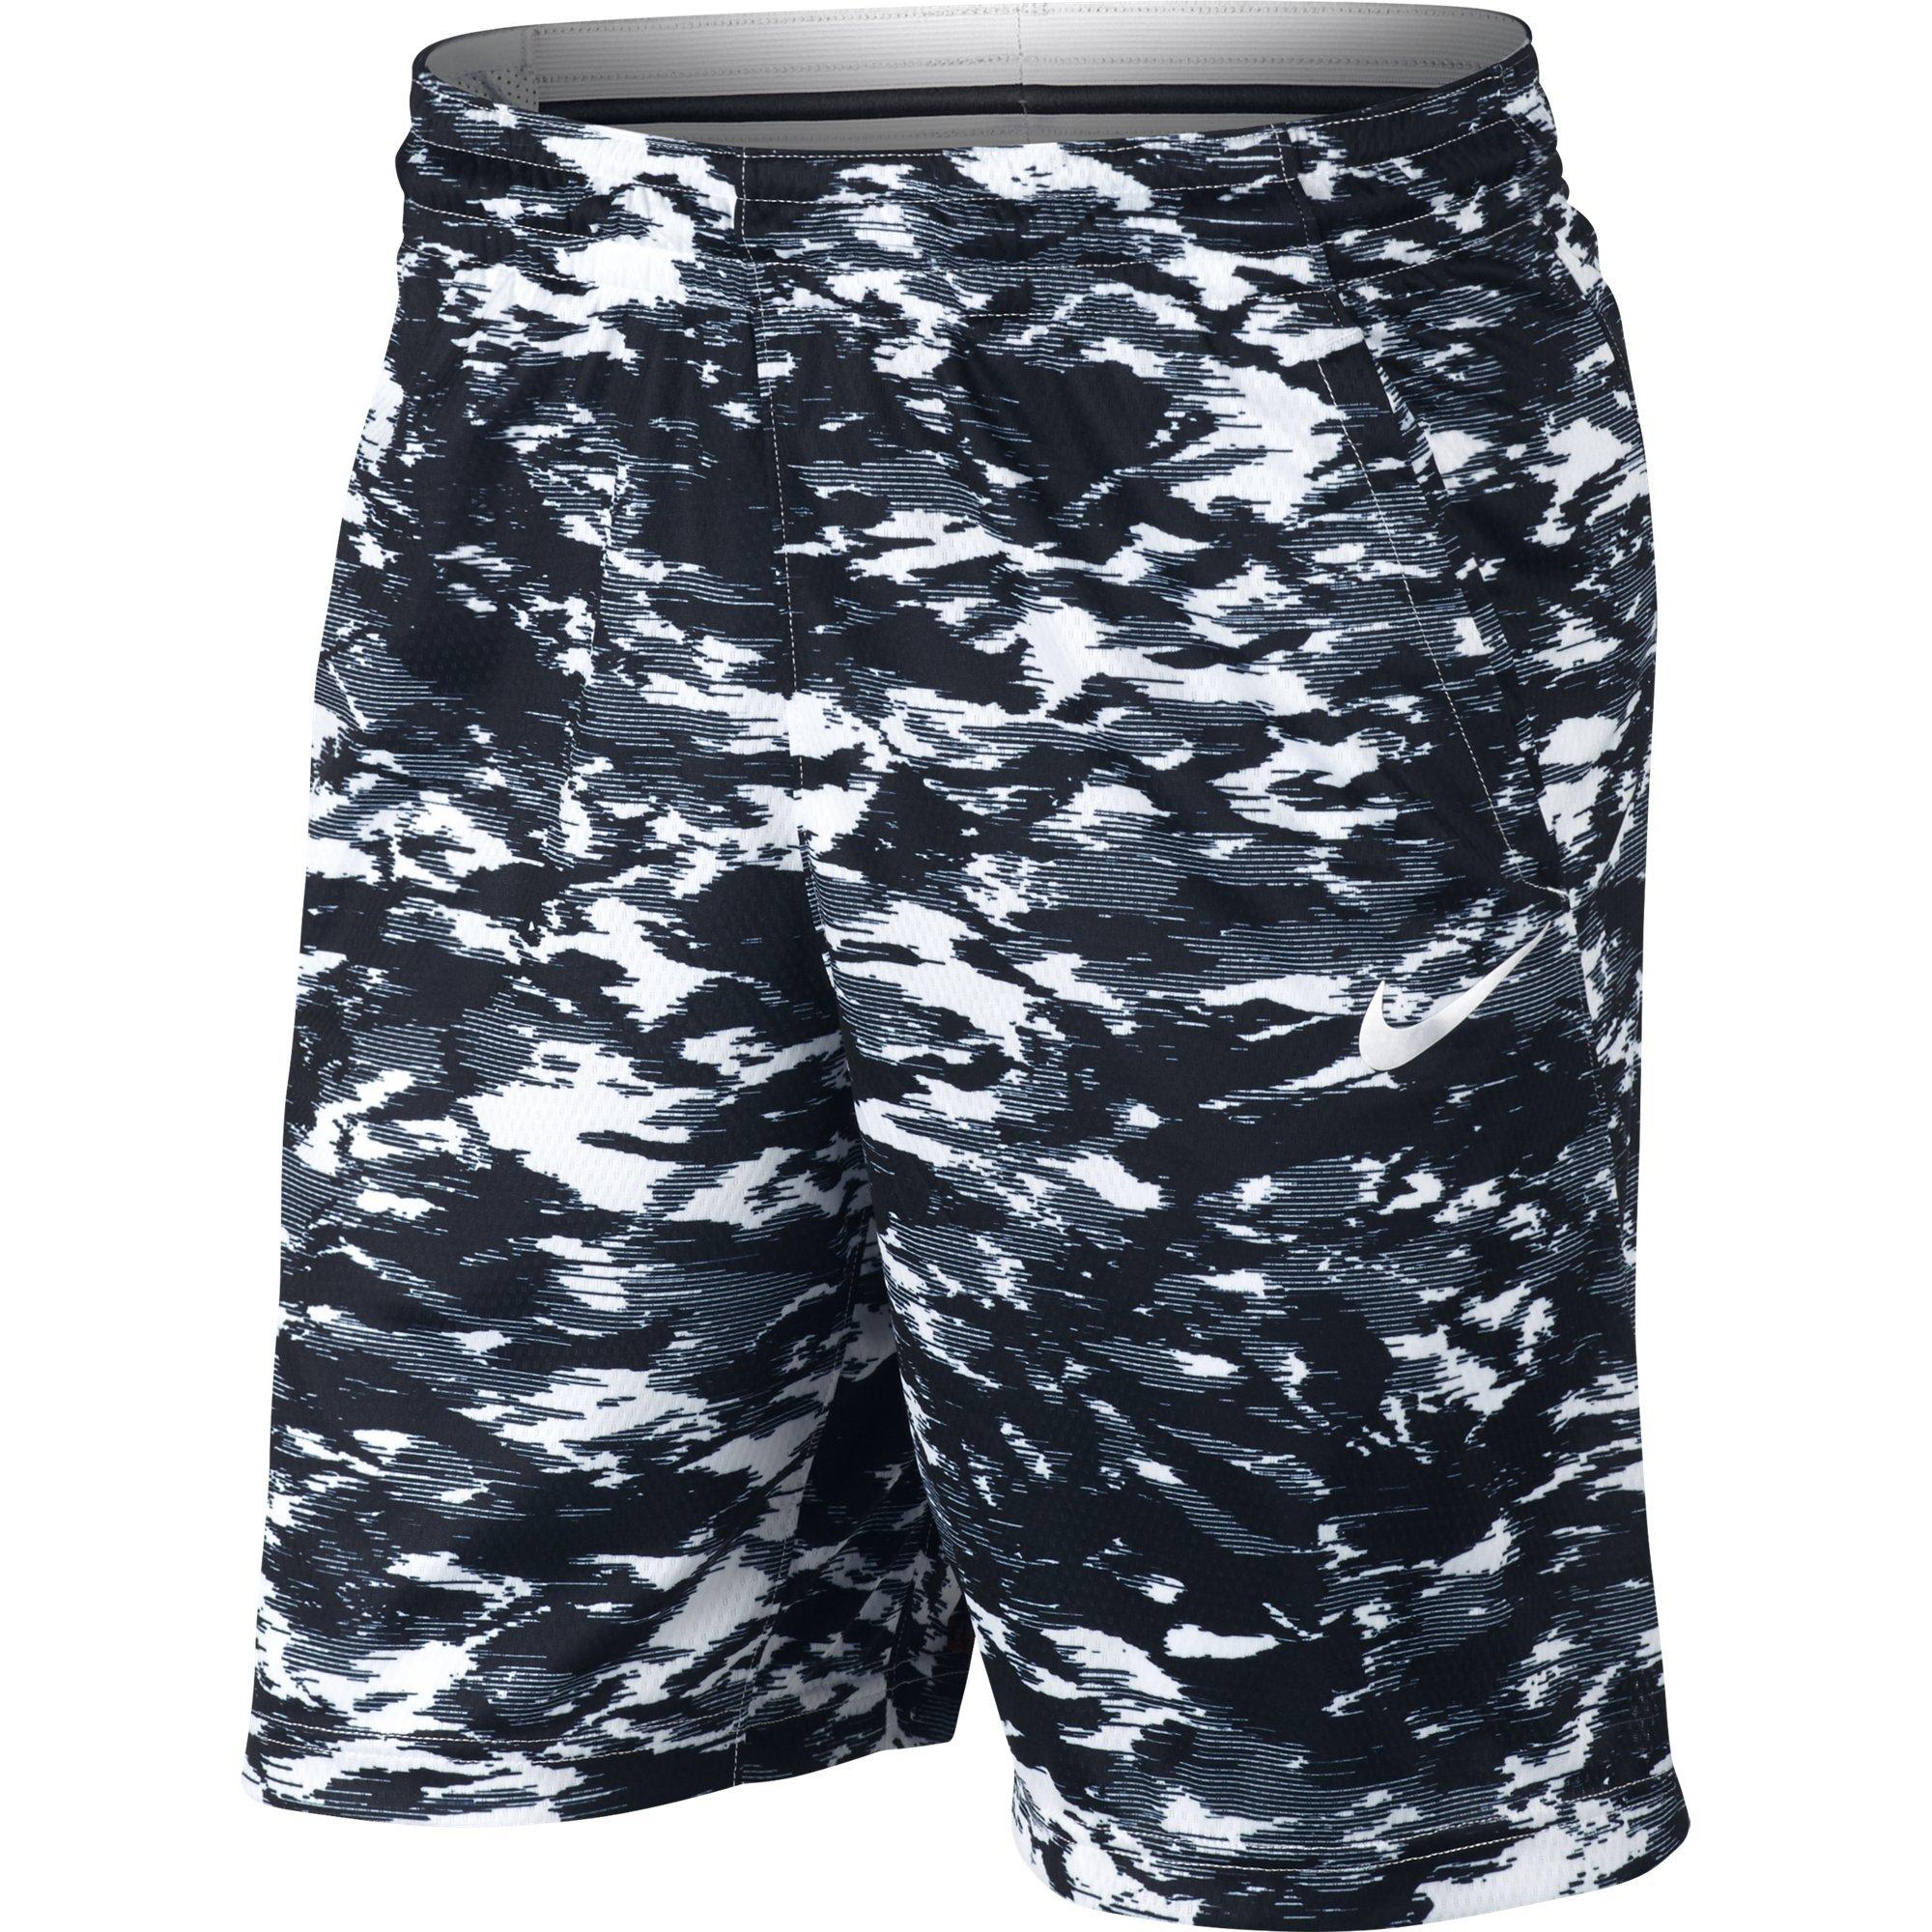 NIKE Men's Dry Print Attack Shorts, White/Black/White, Medium